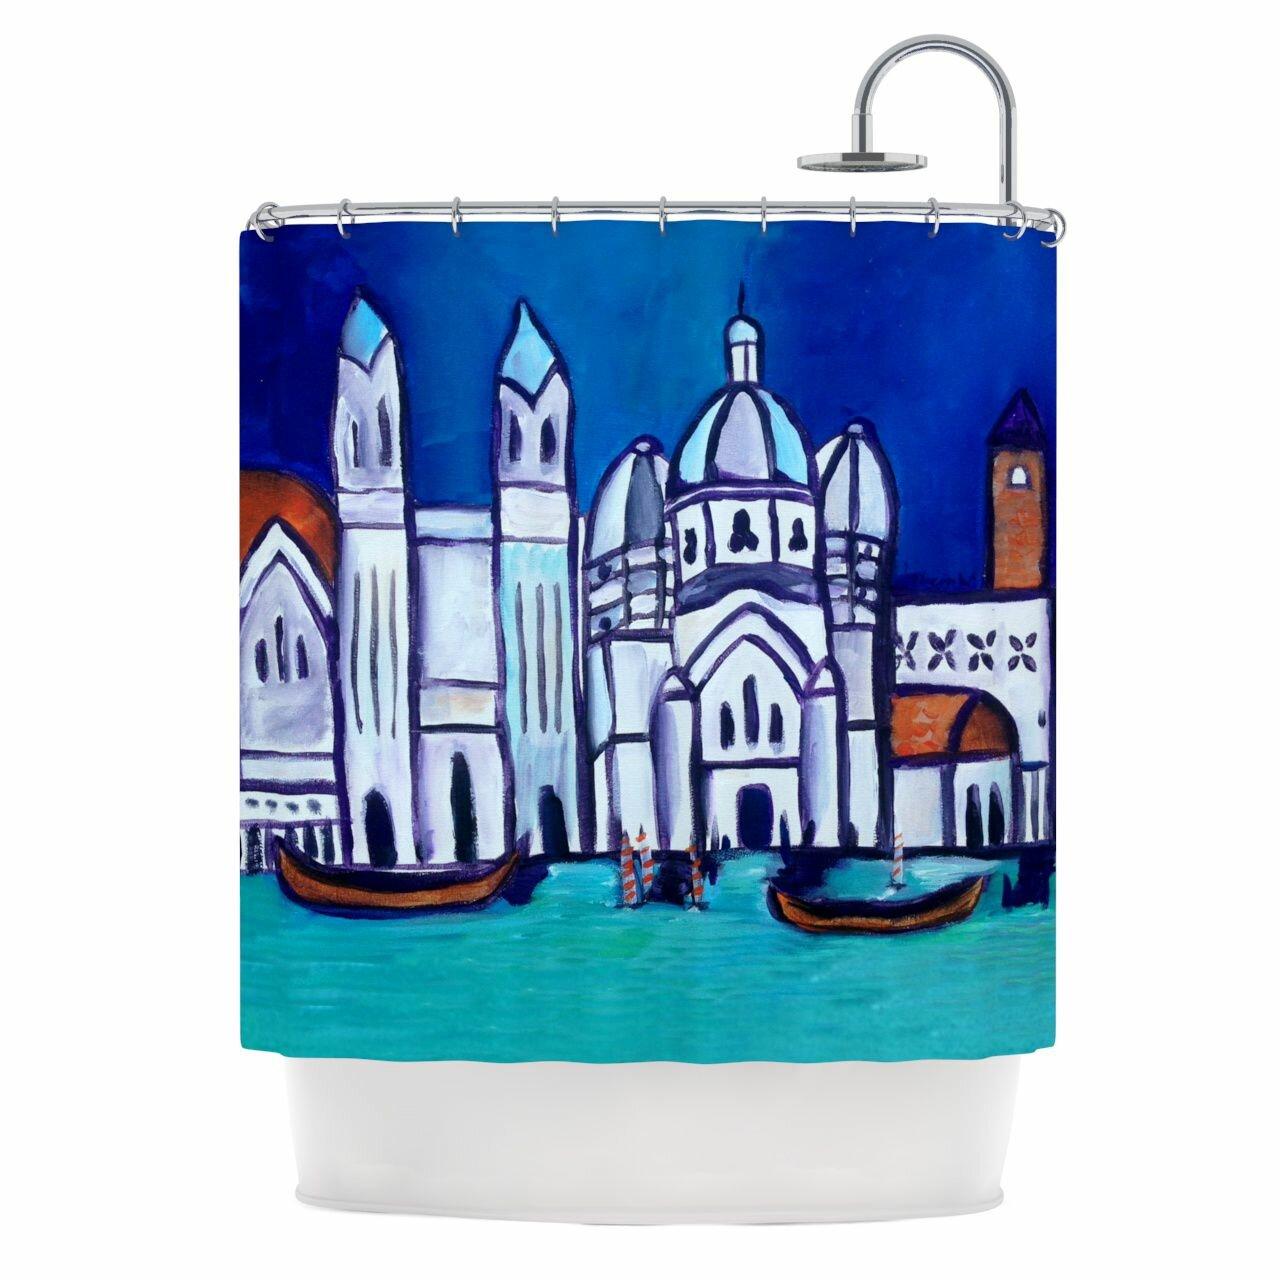 KESS InHouse Venice Shower Curtain